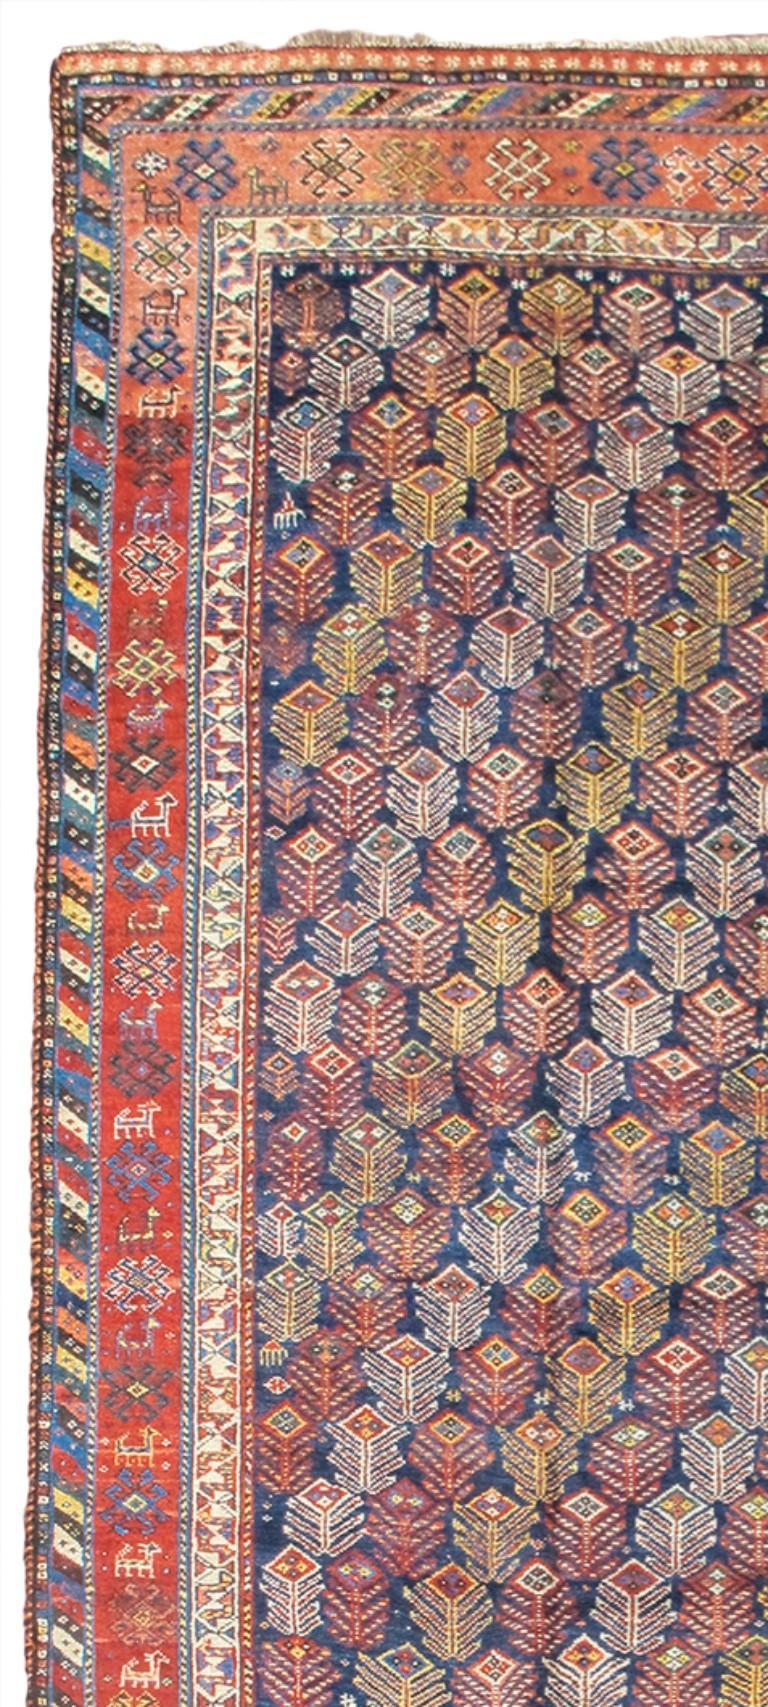 Luri long rug. Measures: 5'3